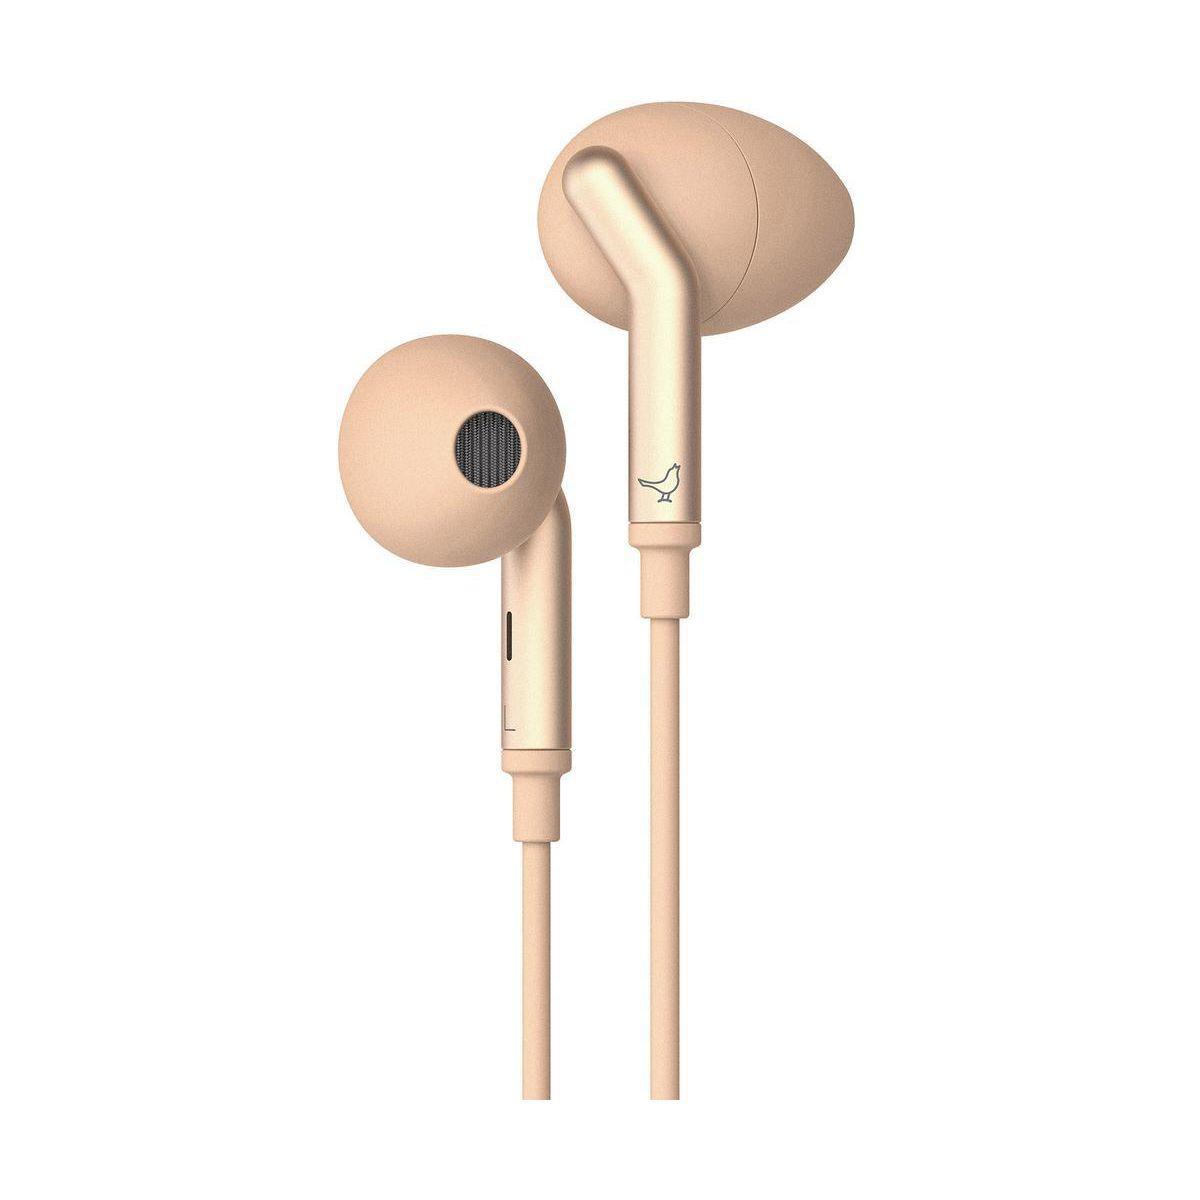 Ecouteurs libratone q adapt in-ear or - livraison offerte : co...